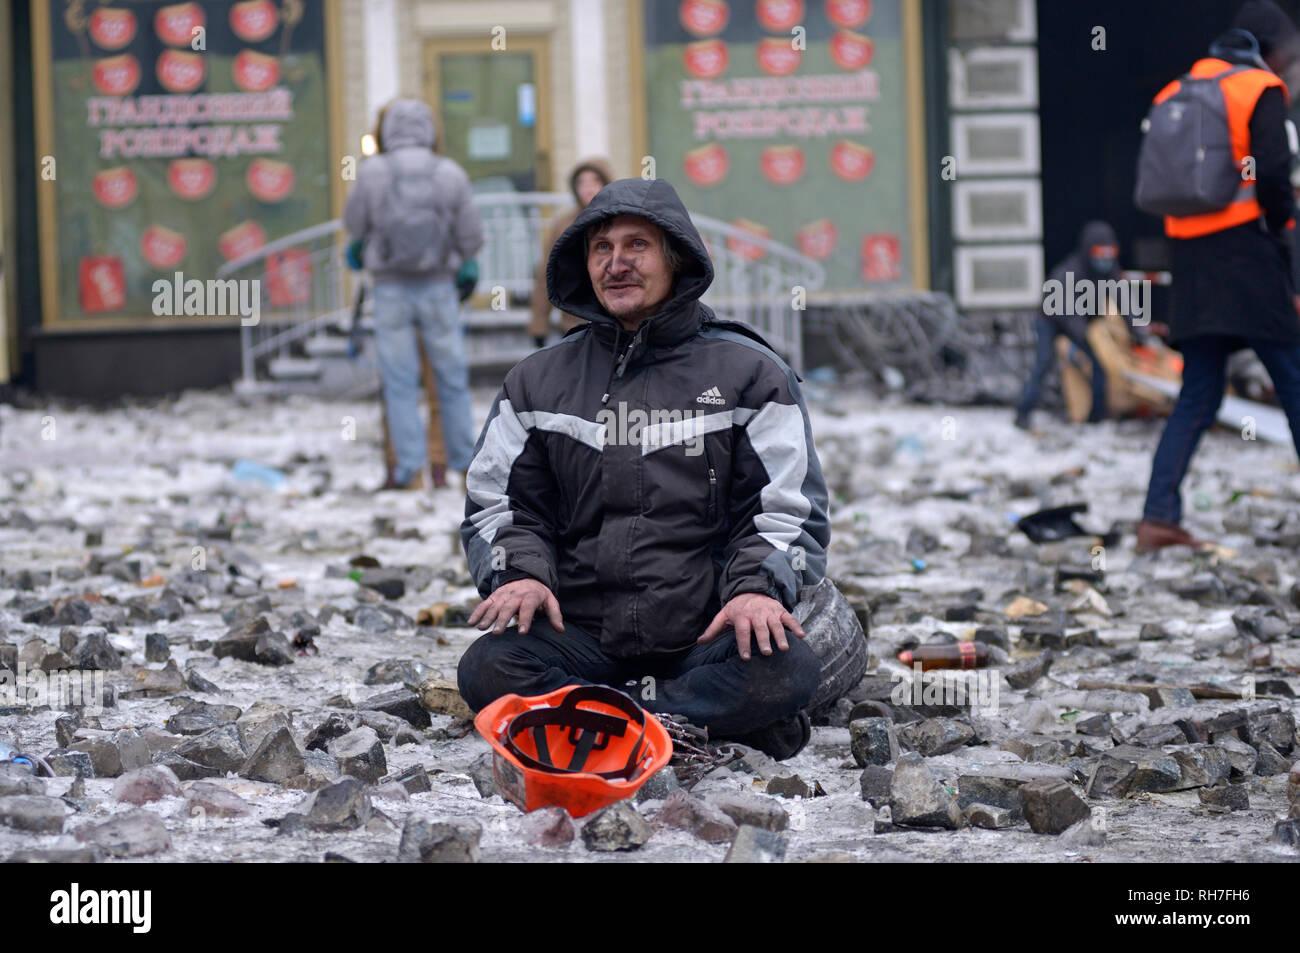 View of Grushevskogo street, protester sitting. Revolution of dignity, street clashes. January 21, 2014. Kiev, Ukraine - Stock Image